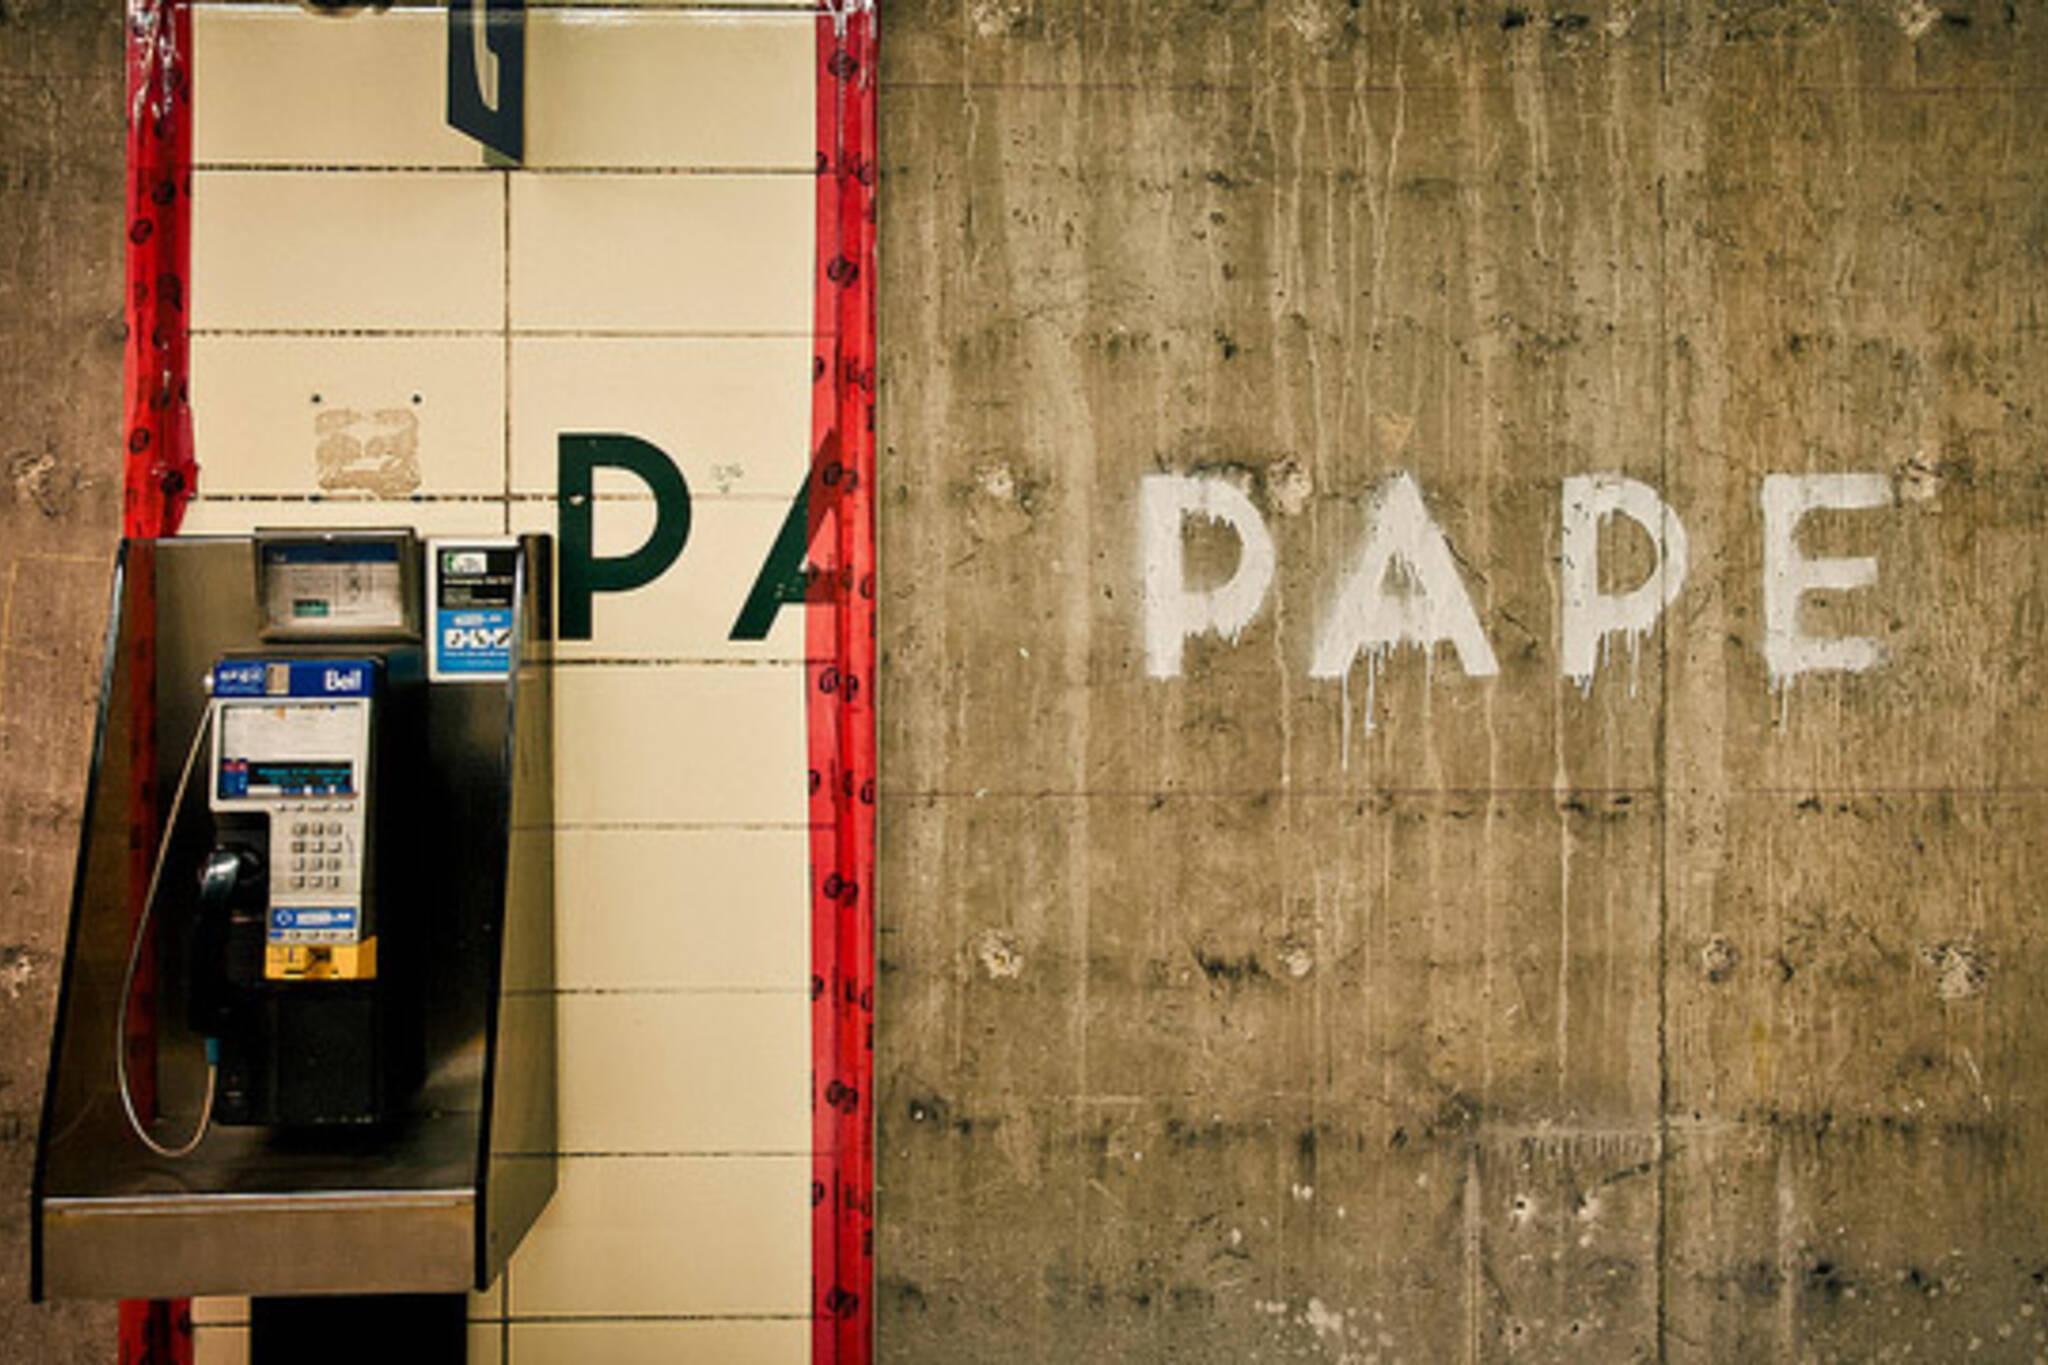 Pape station